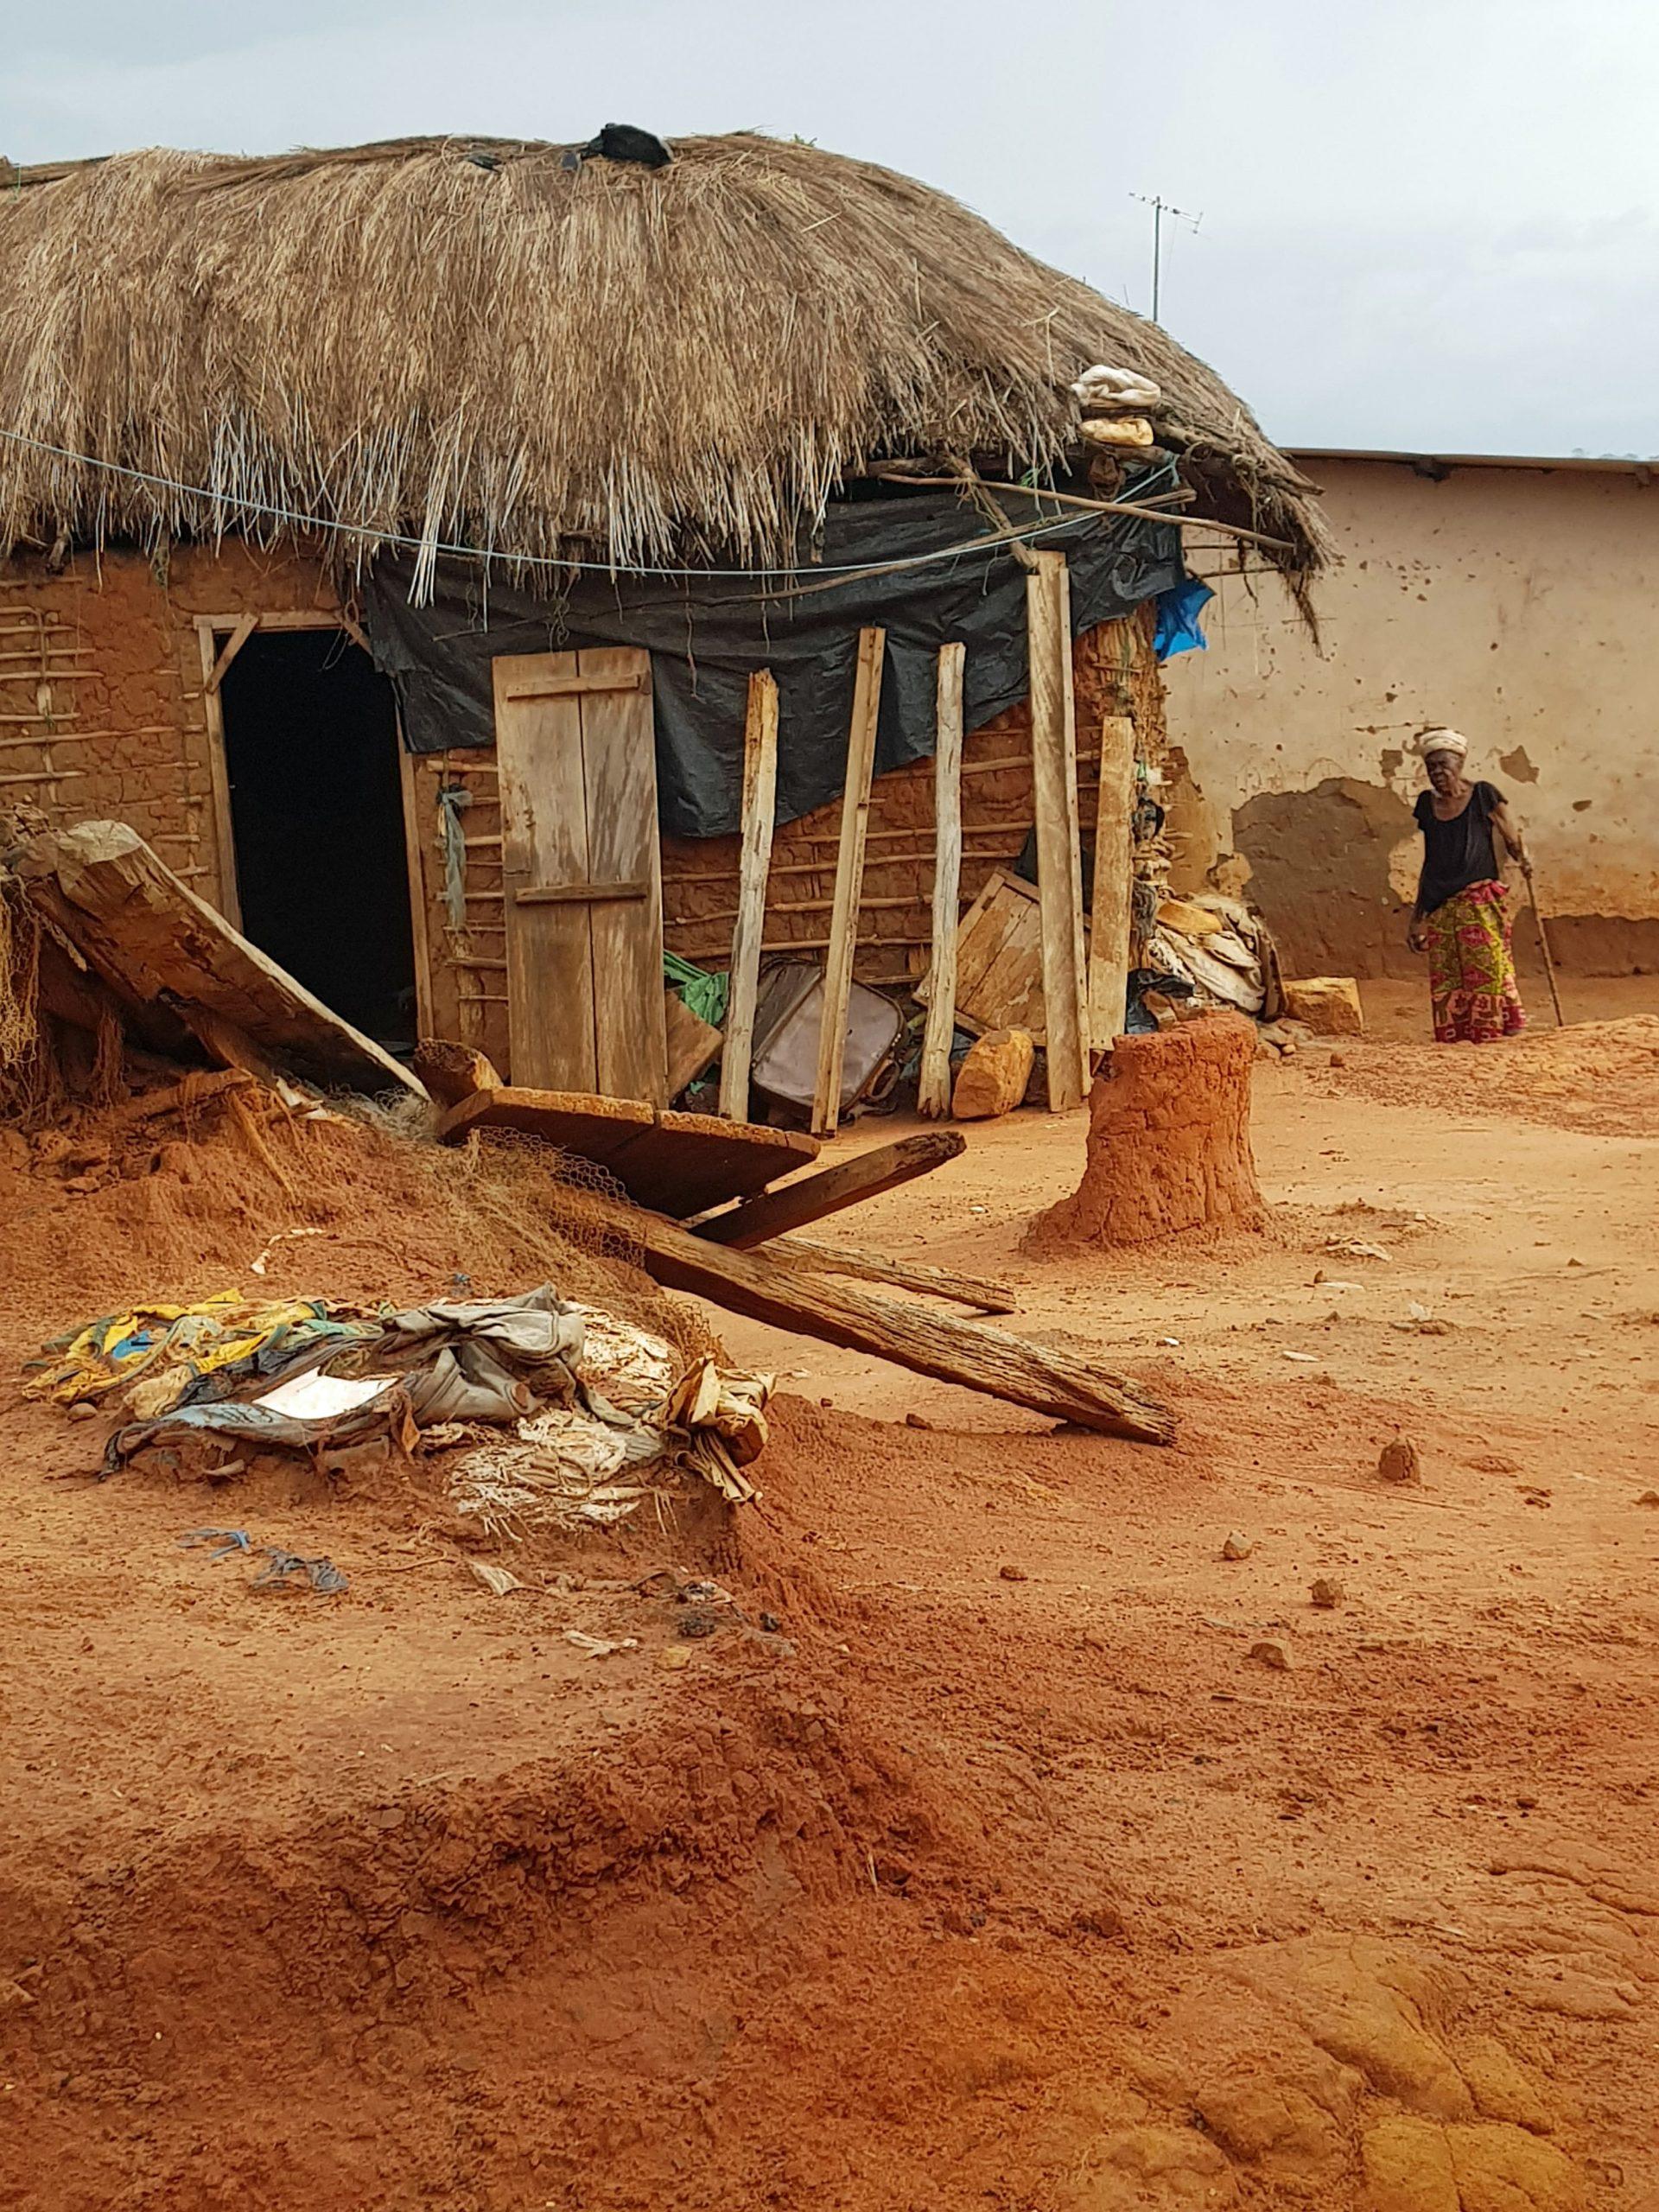 A local house in poor repair - beekeeping income improves livelihoods